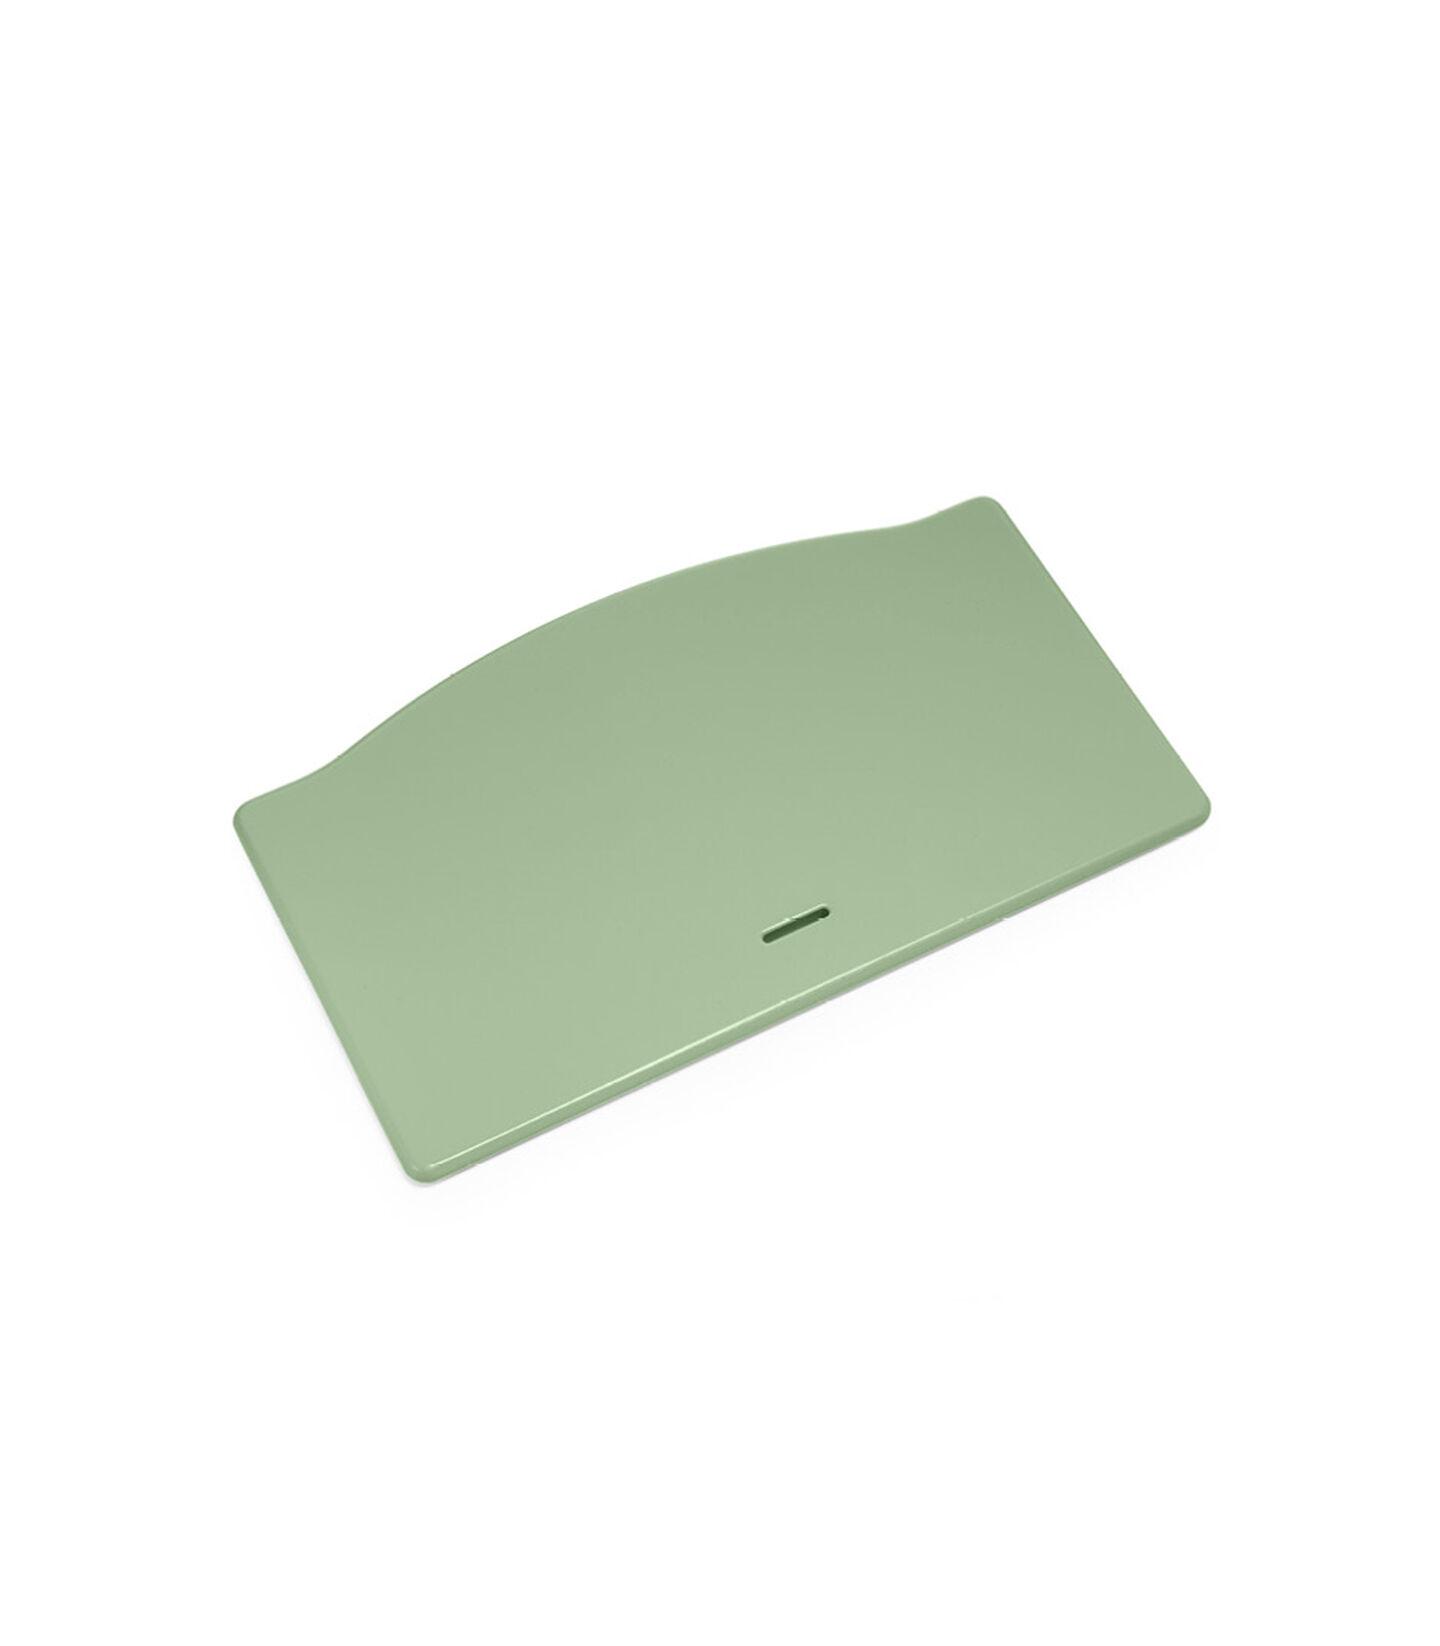 Tripp Trapp® Seatplate Moss Green, Verde Muschio, mainview view 2